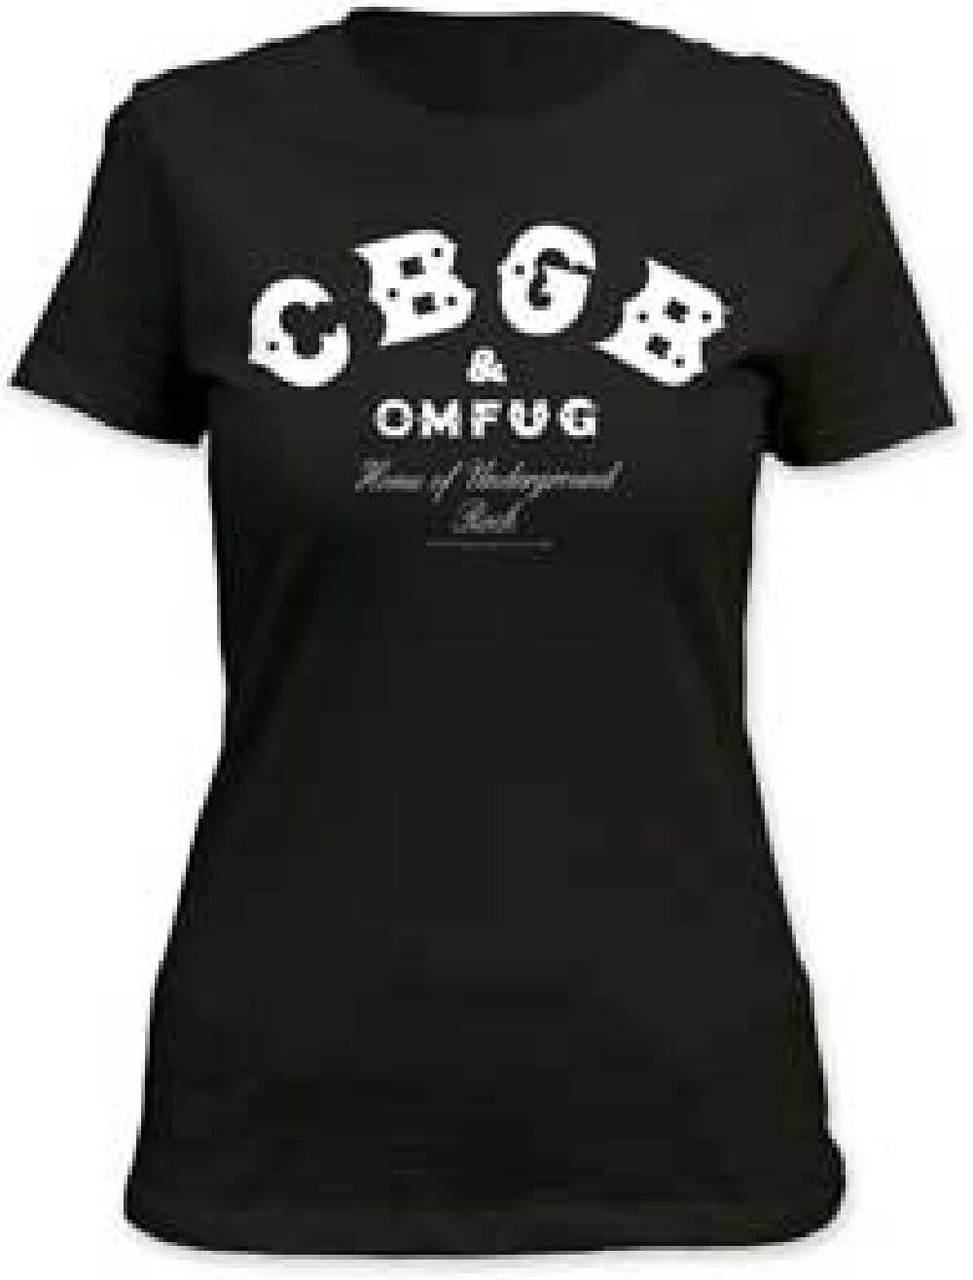 bbe264c8b CBGBs Women's T-shirt - Home of Underground Rock Logo | Women's Crew Neck